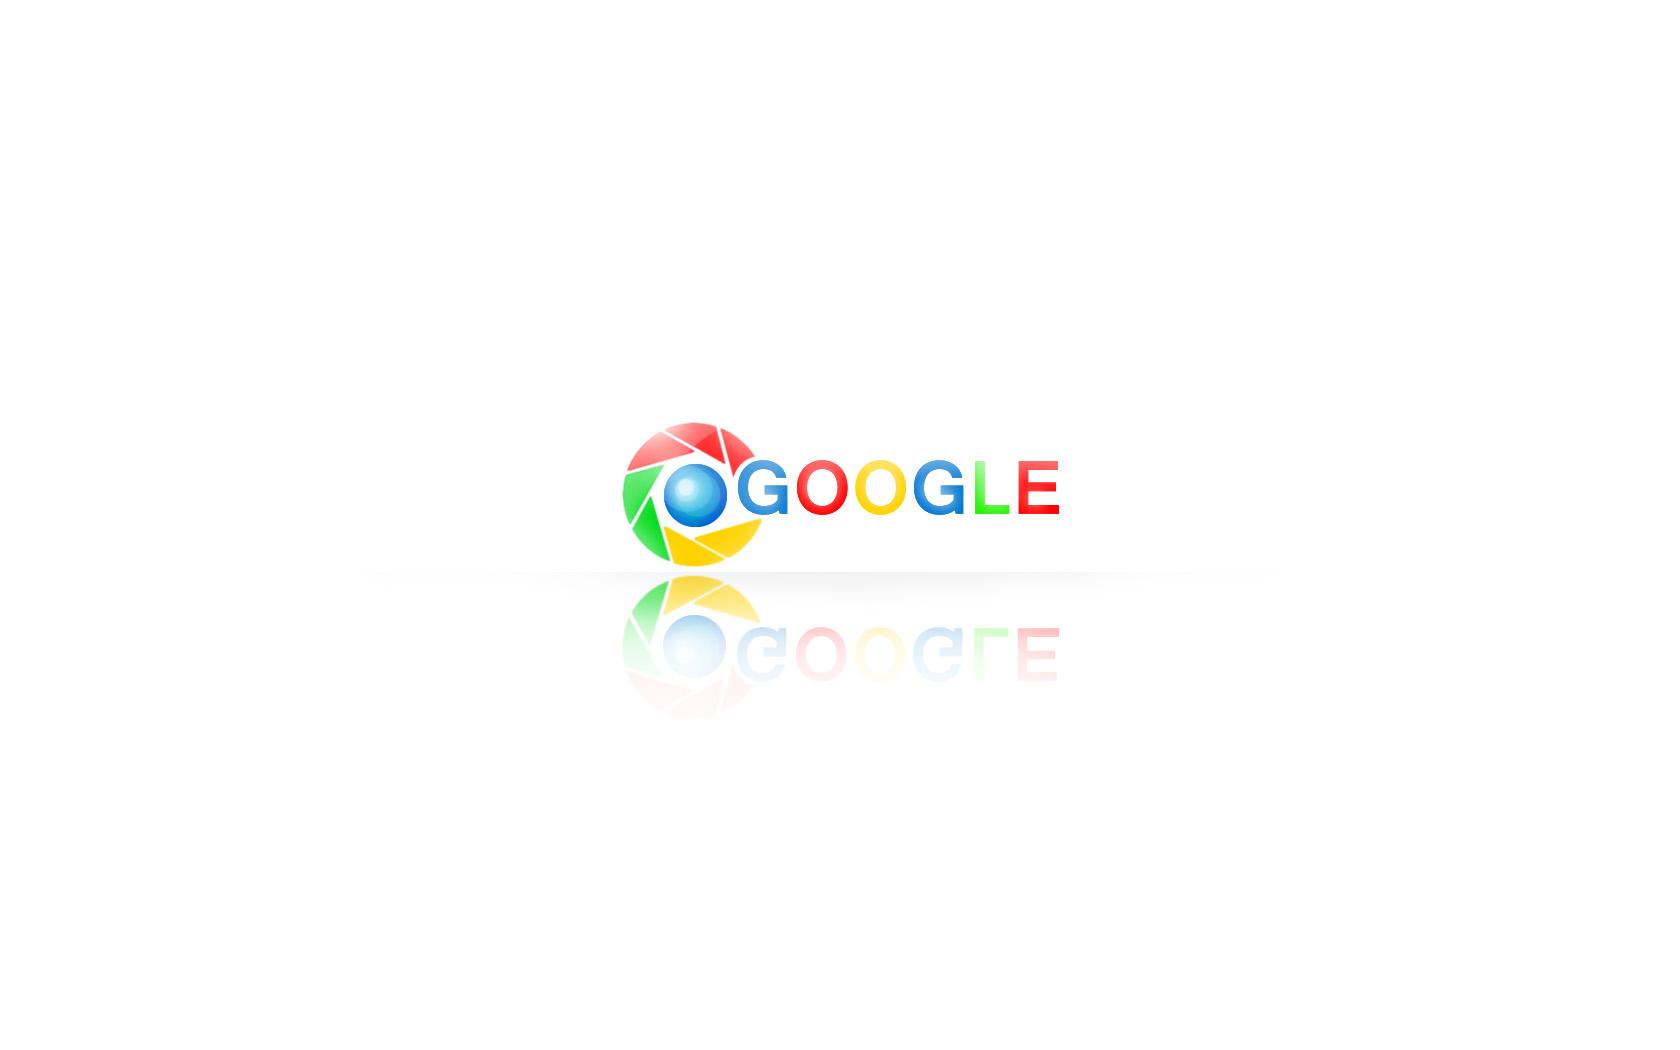 Google Chrome Wallpapers Google Chrome Myspace Backgrounds Google 1680x1050